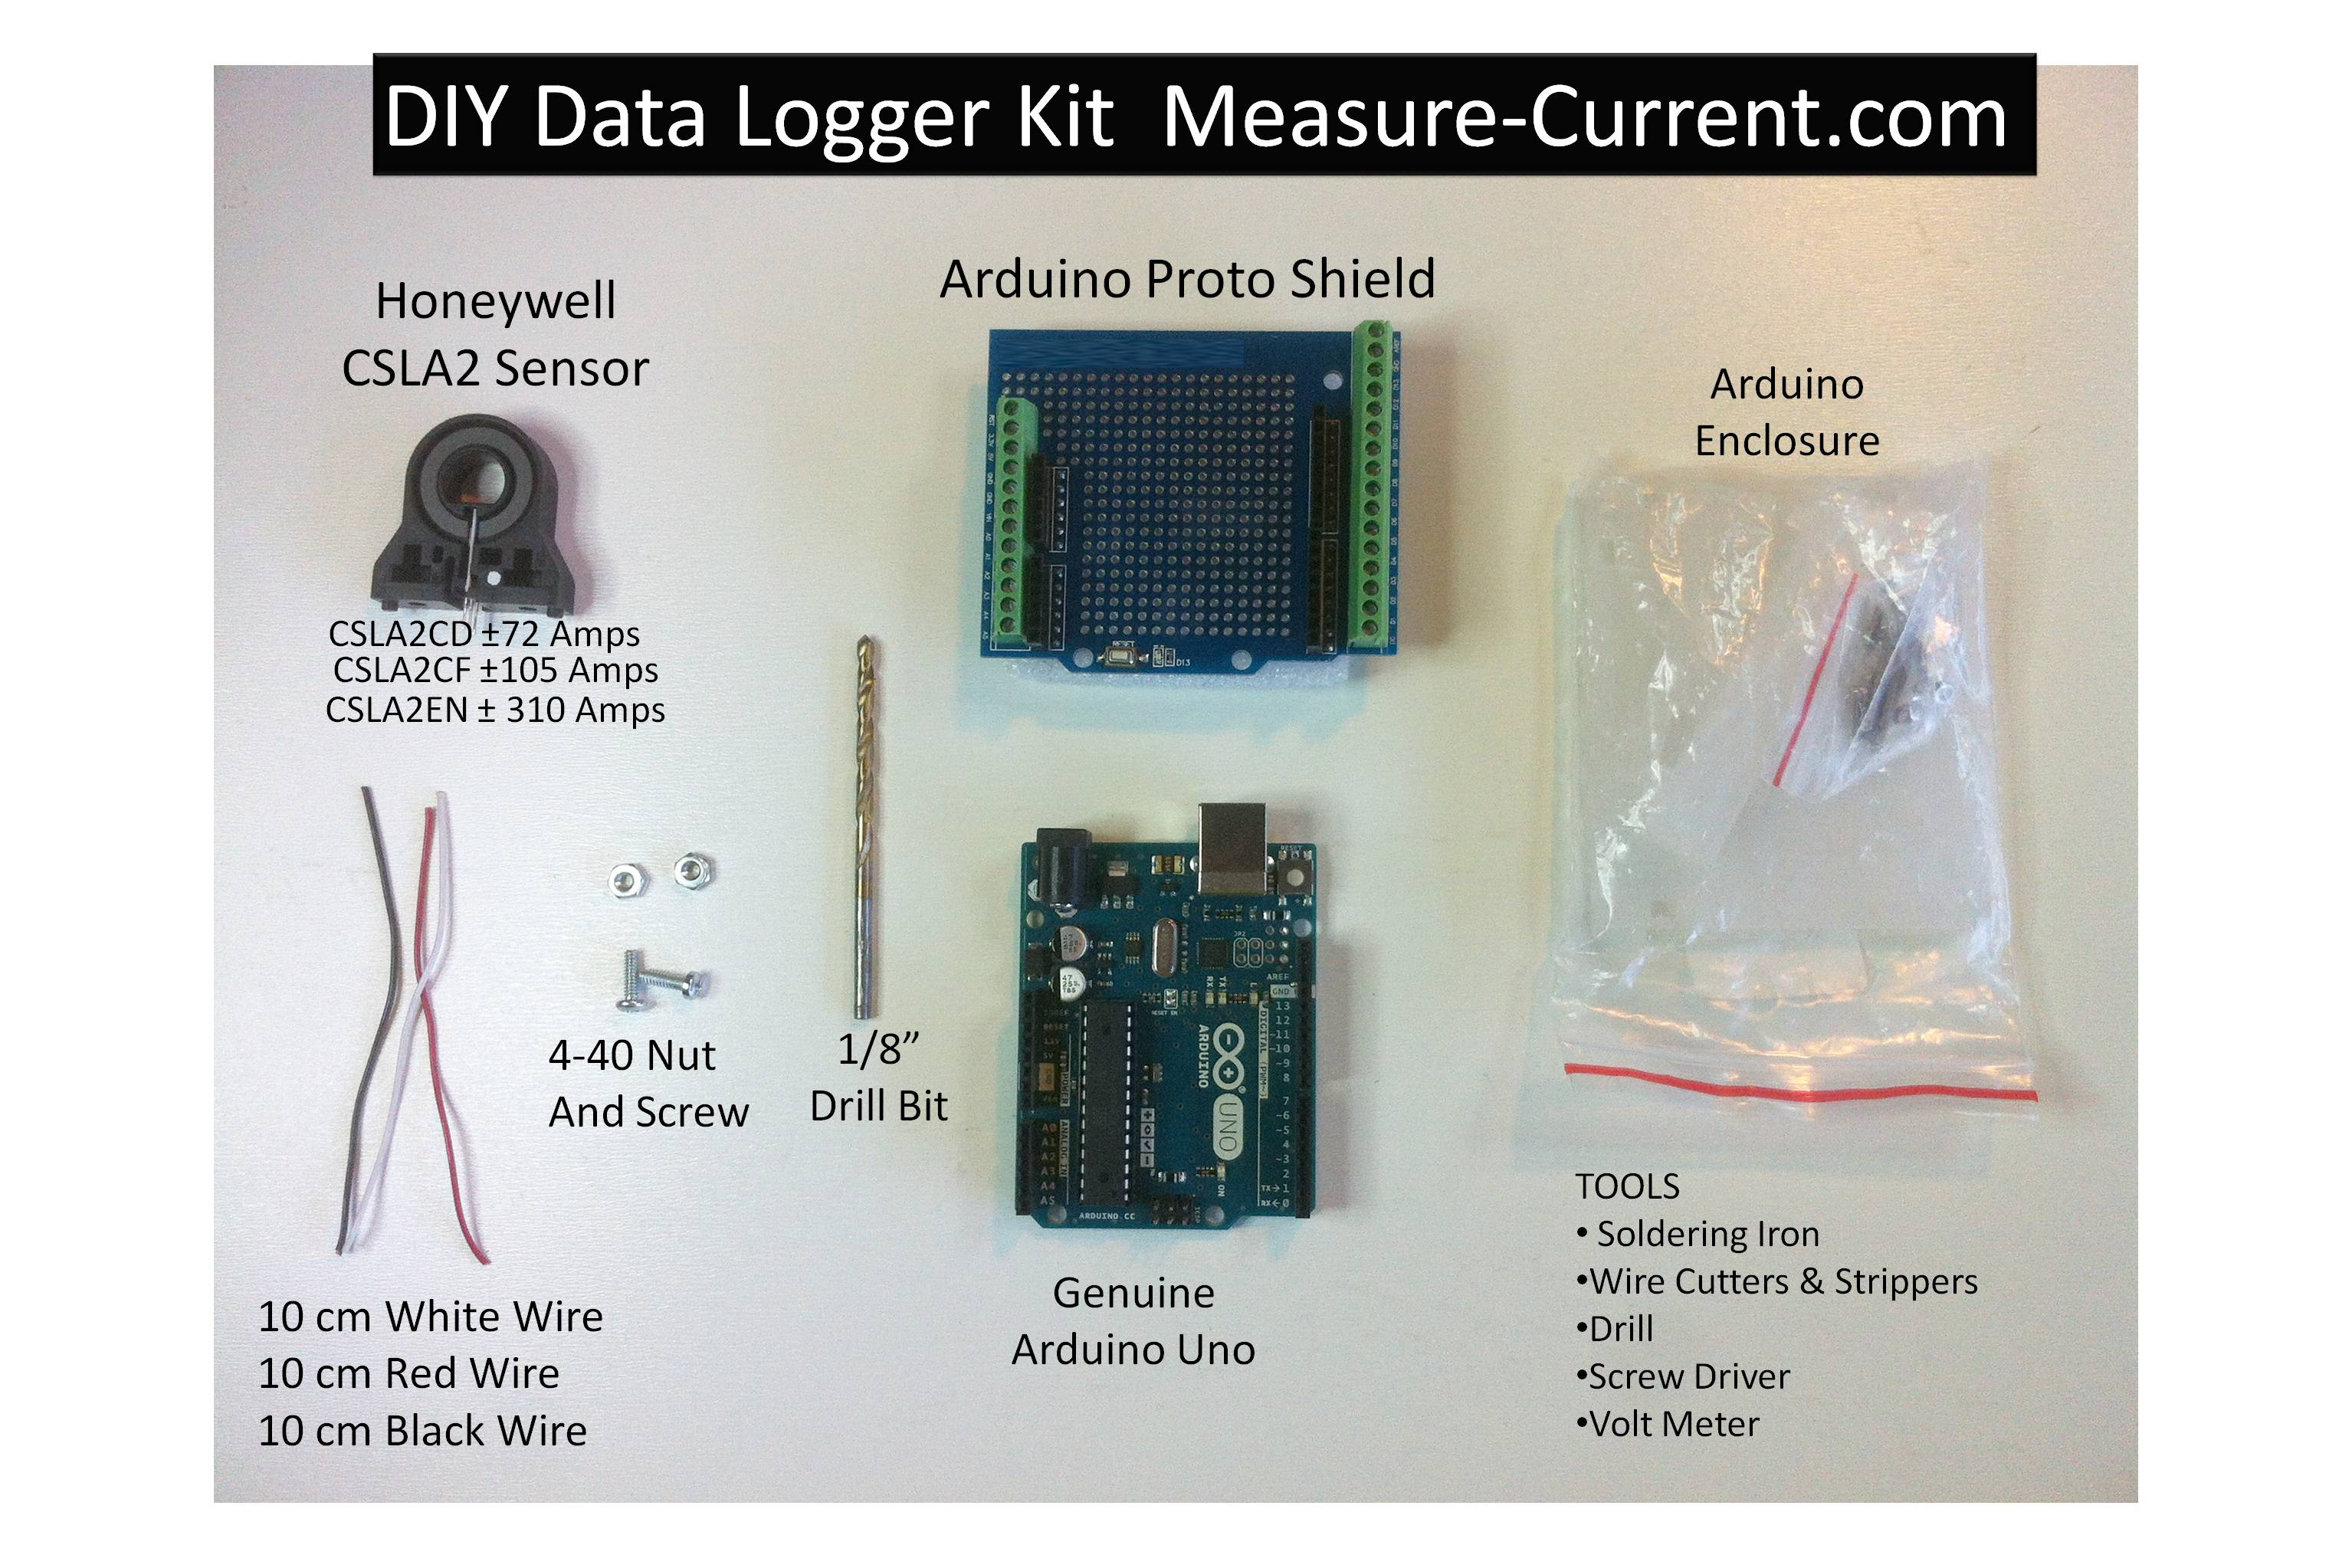 Diy Byo Do It Yourself Ac Dc Hall Effect Current Sensor Transducer Currentsensorcircuit1jpg Arduino Amps Data Logger Kit Free Plans